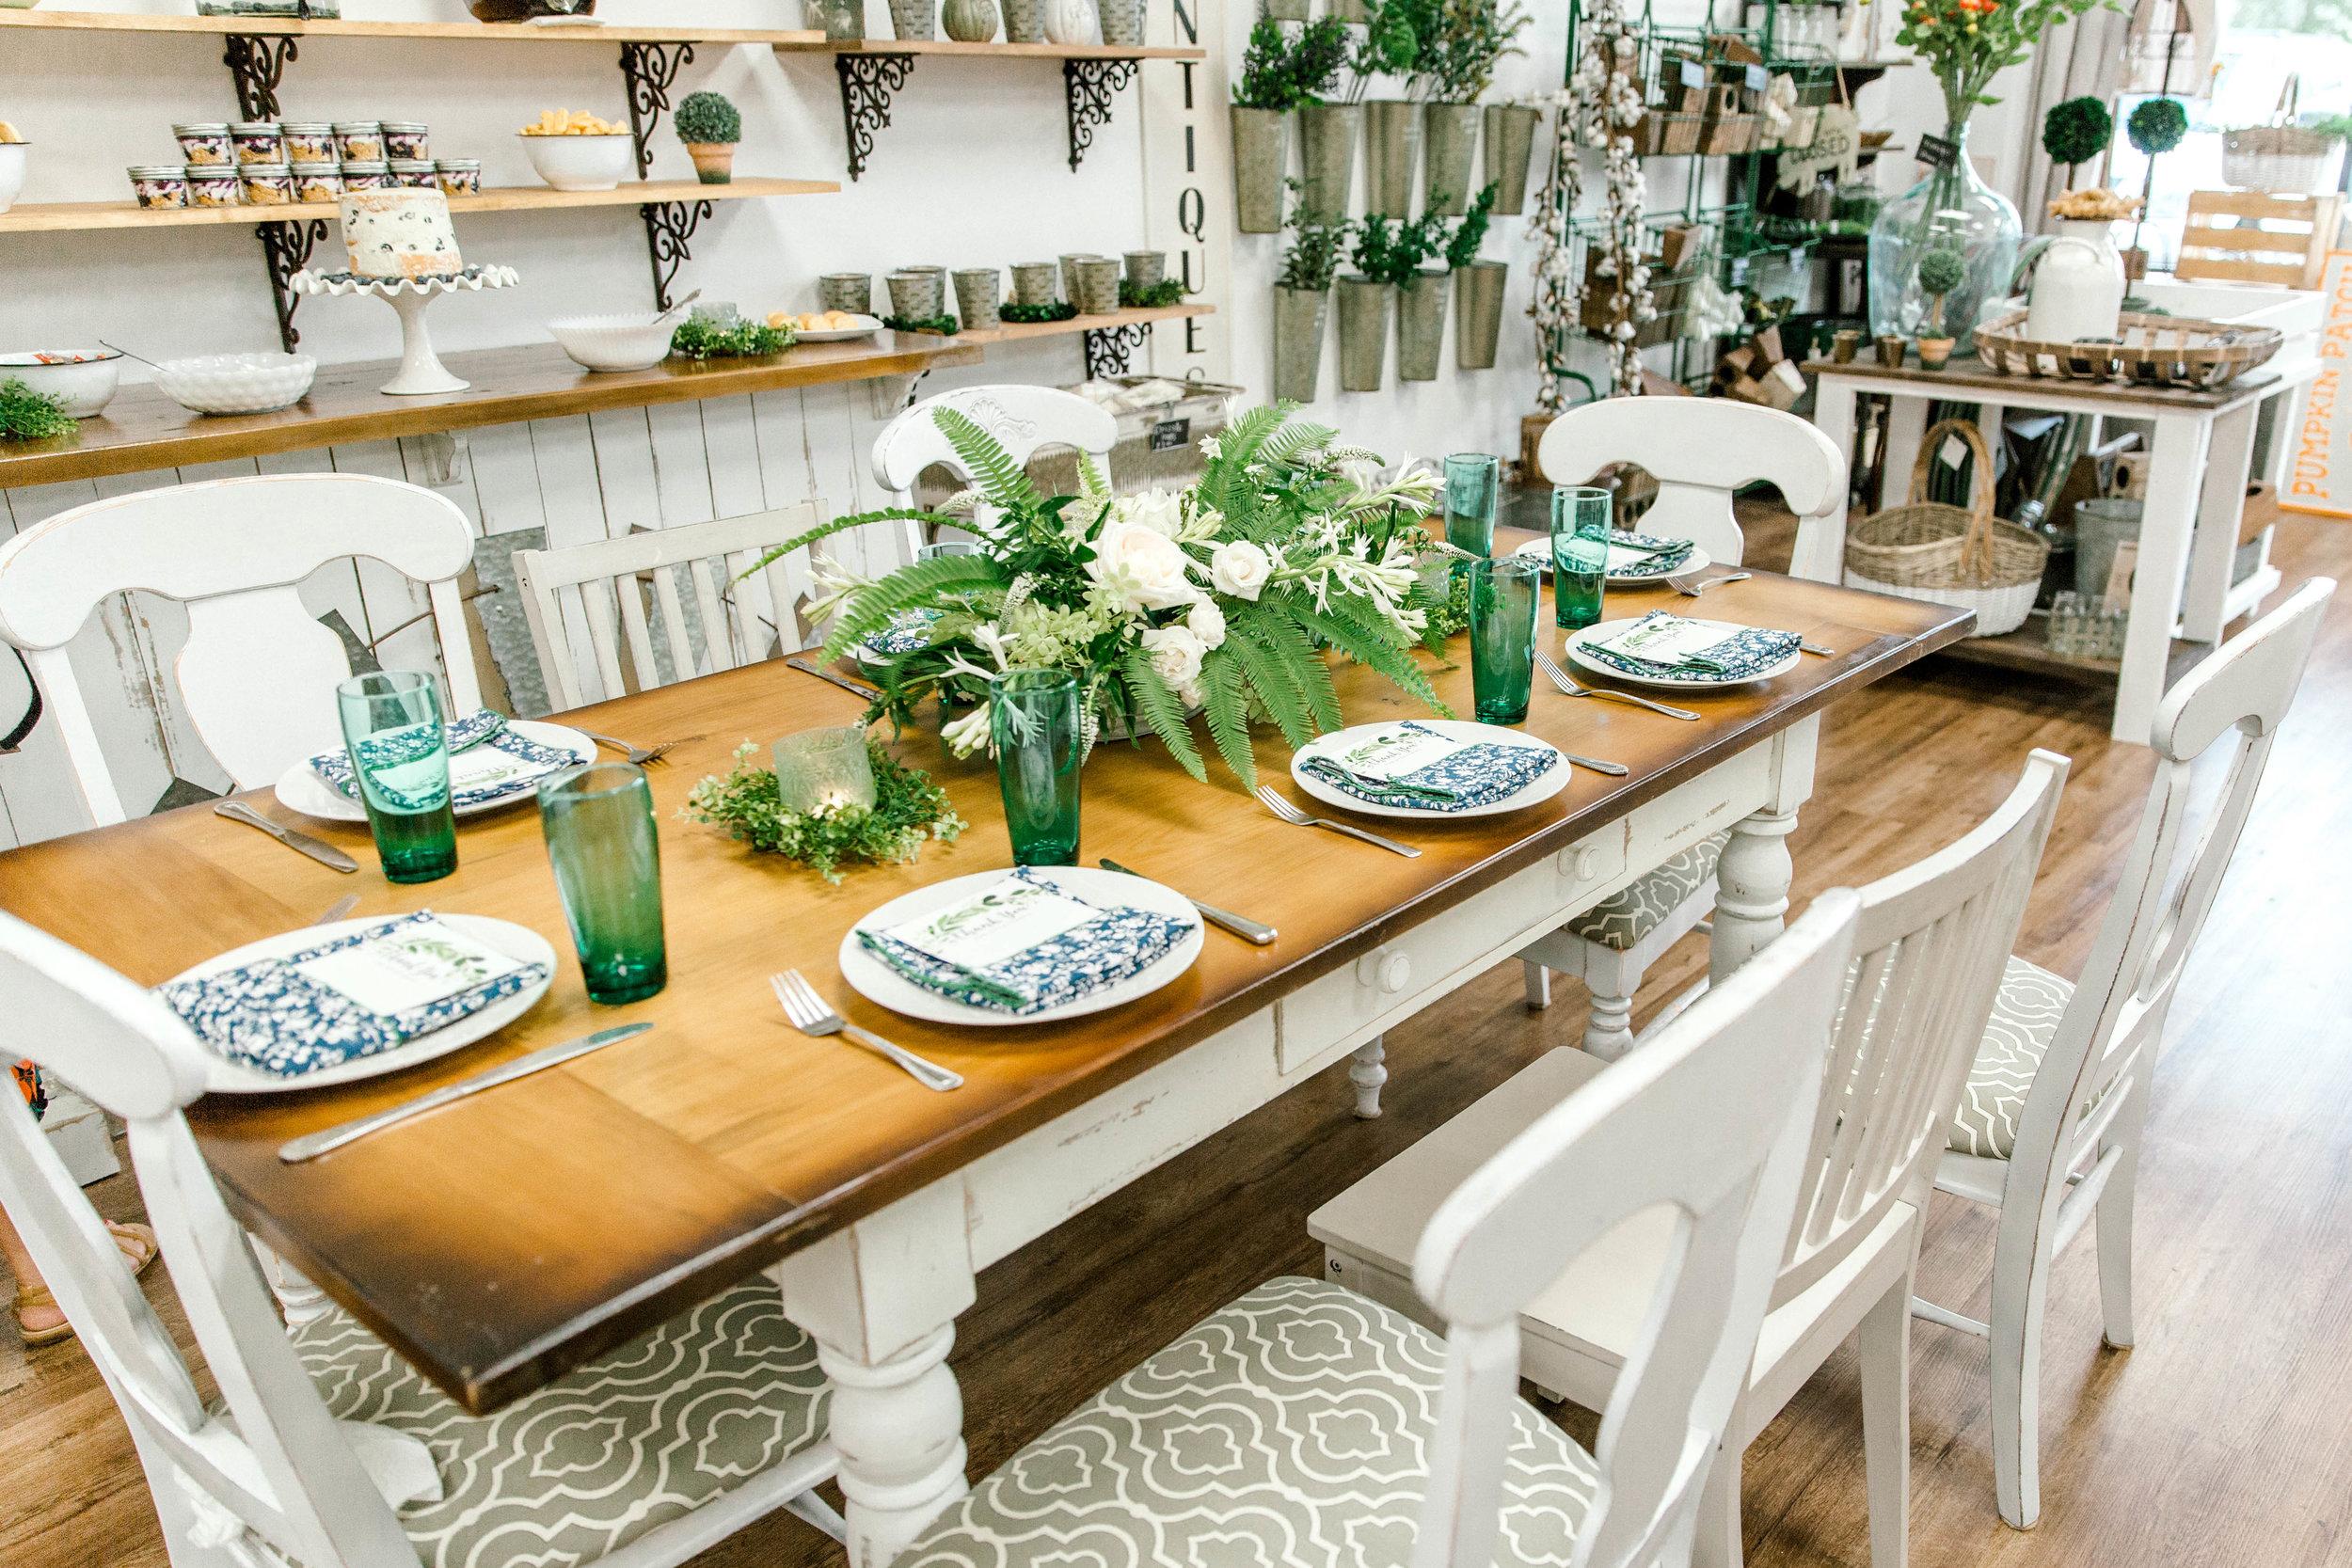 A Rustic Lanter Co Wedding - The Overwhelmed Bride Wedding Ideas Blog